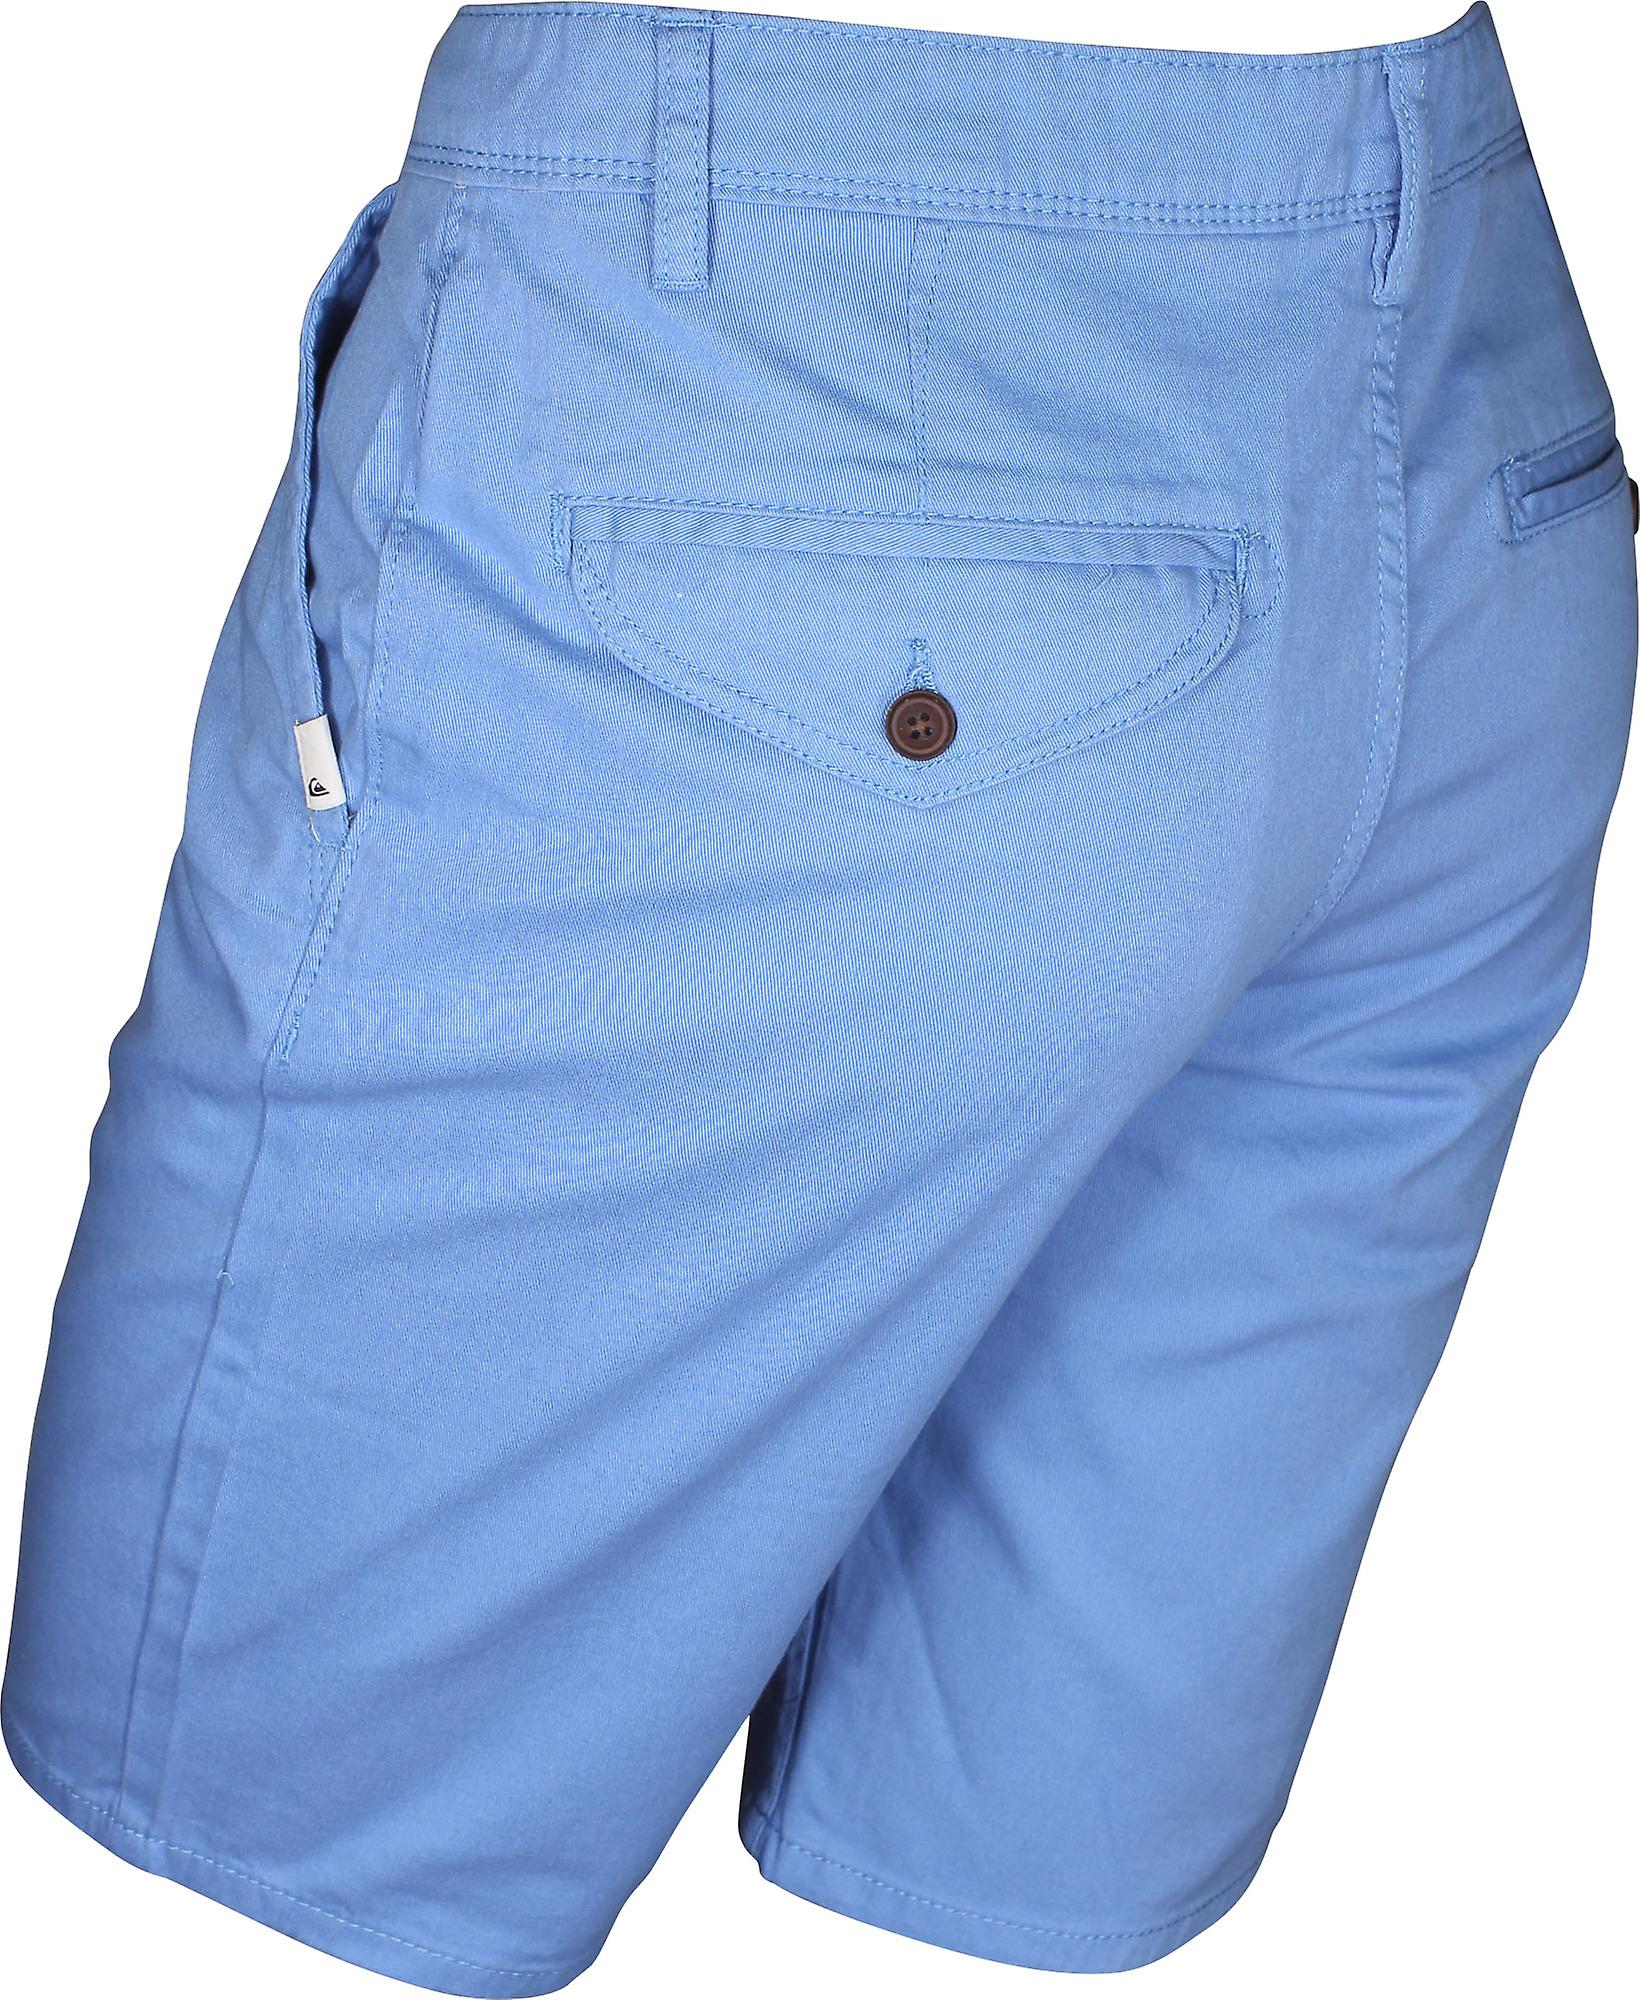 Quiksilver Mens nye daglige Chino Shorts - Silver Lake blå